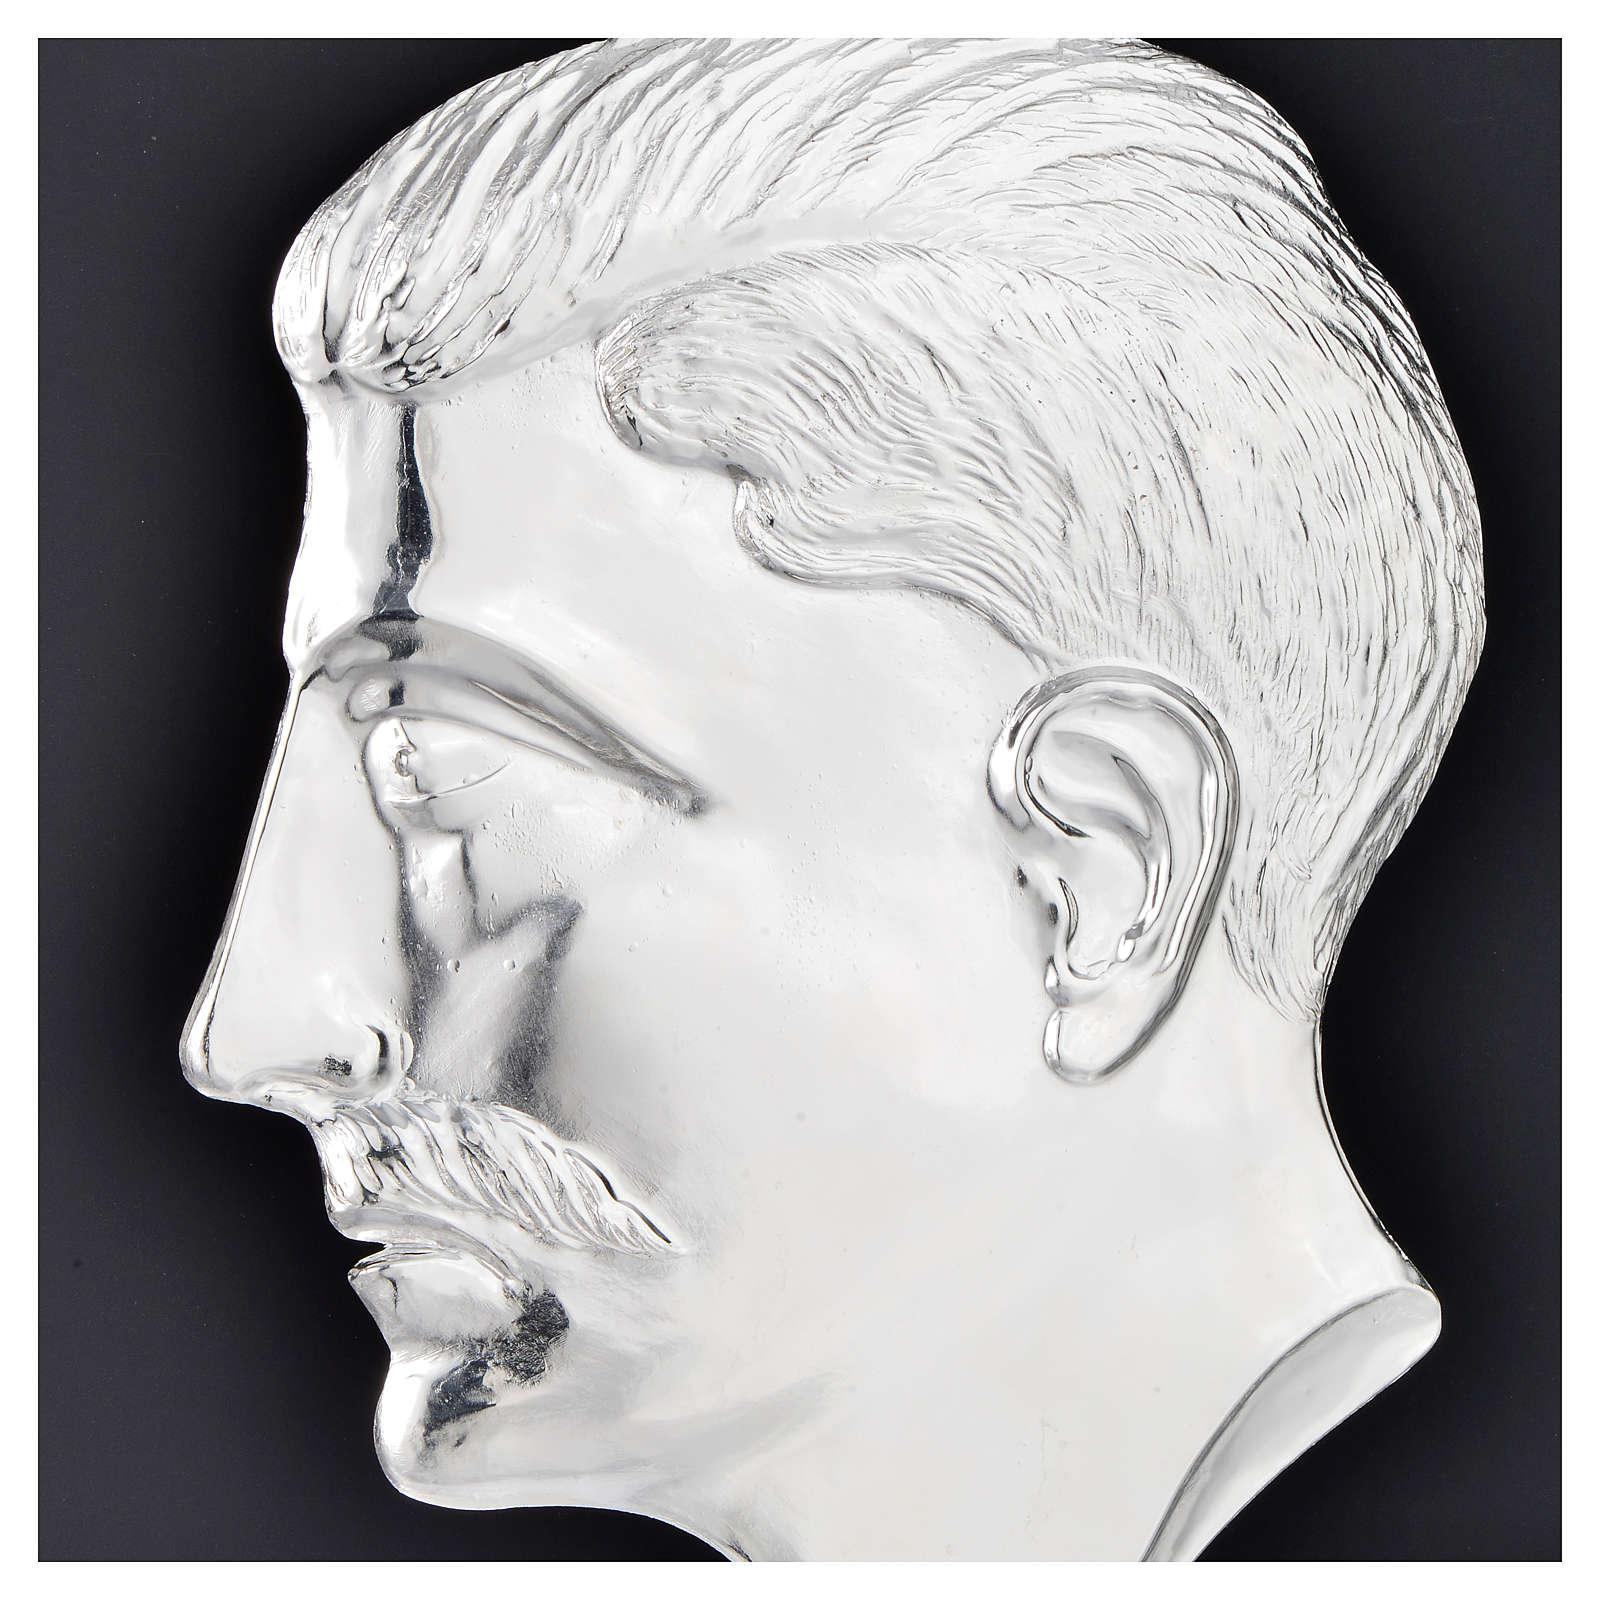 Ex-voto, male head in sterling silver or metal 15cm 3